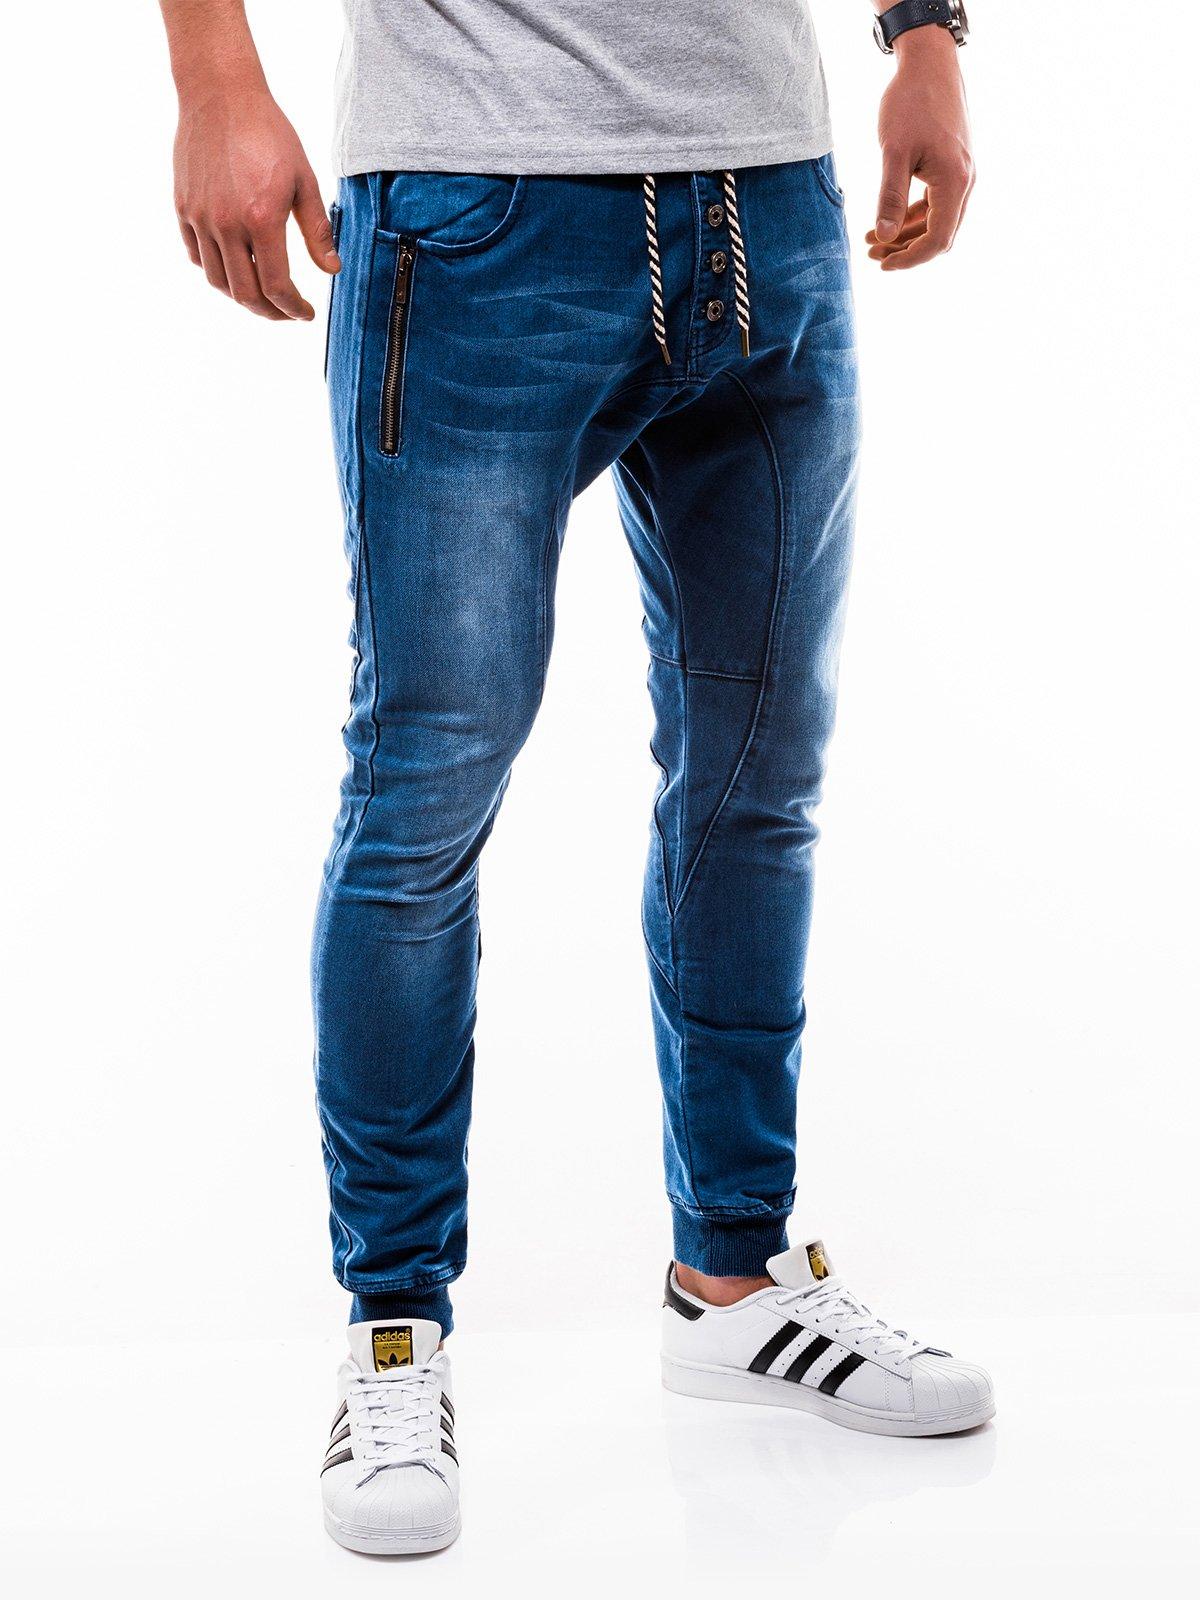 Ombre Clothing jeans joggers P198 pánske